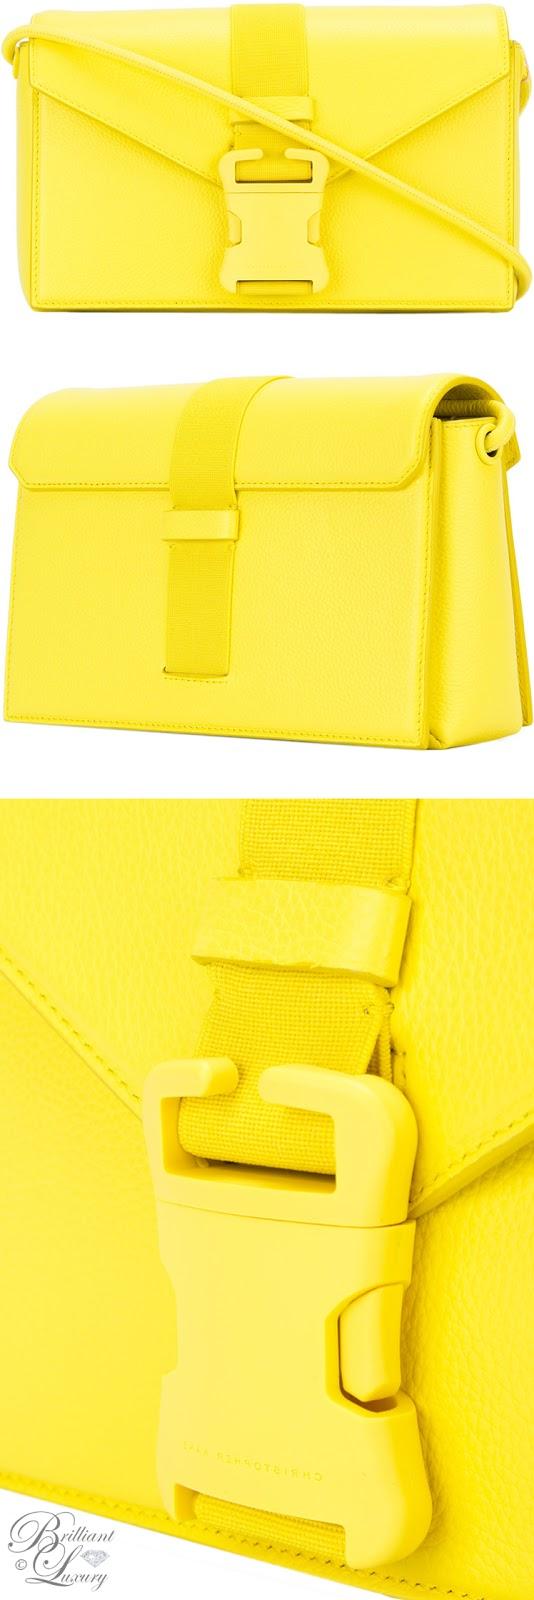 Brilliant Luxury ♦ Christopher Kane Devine yellow shoulder bag